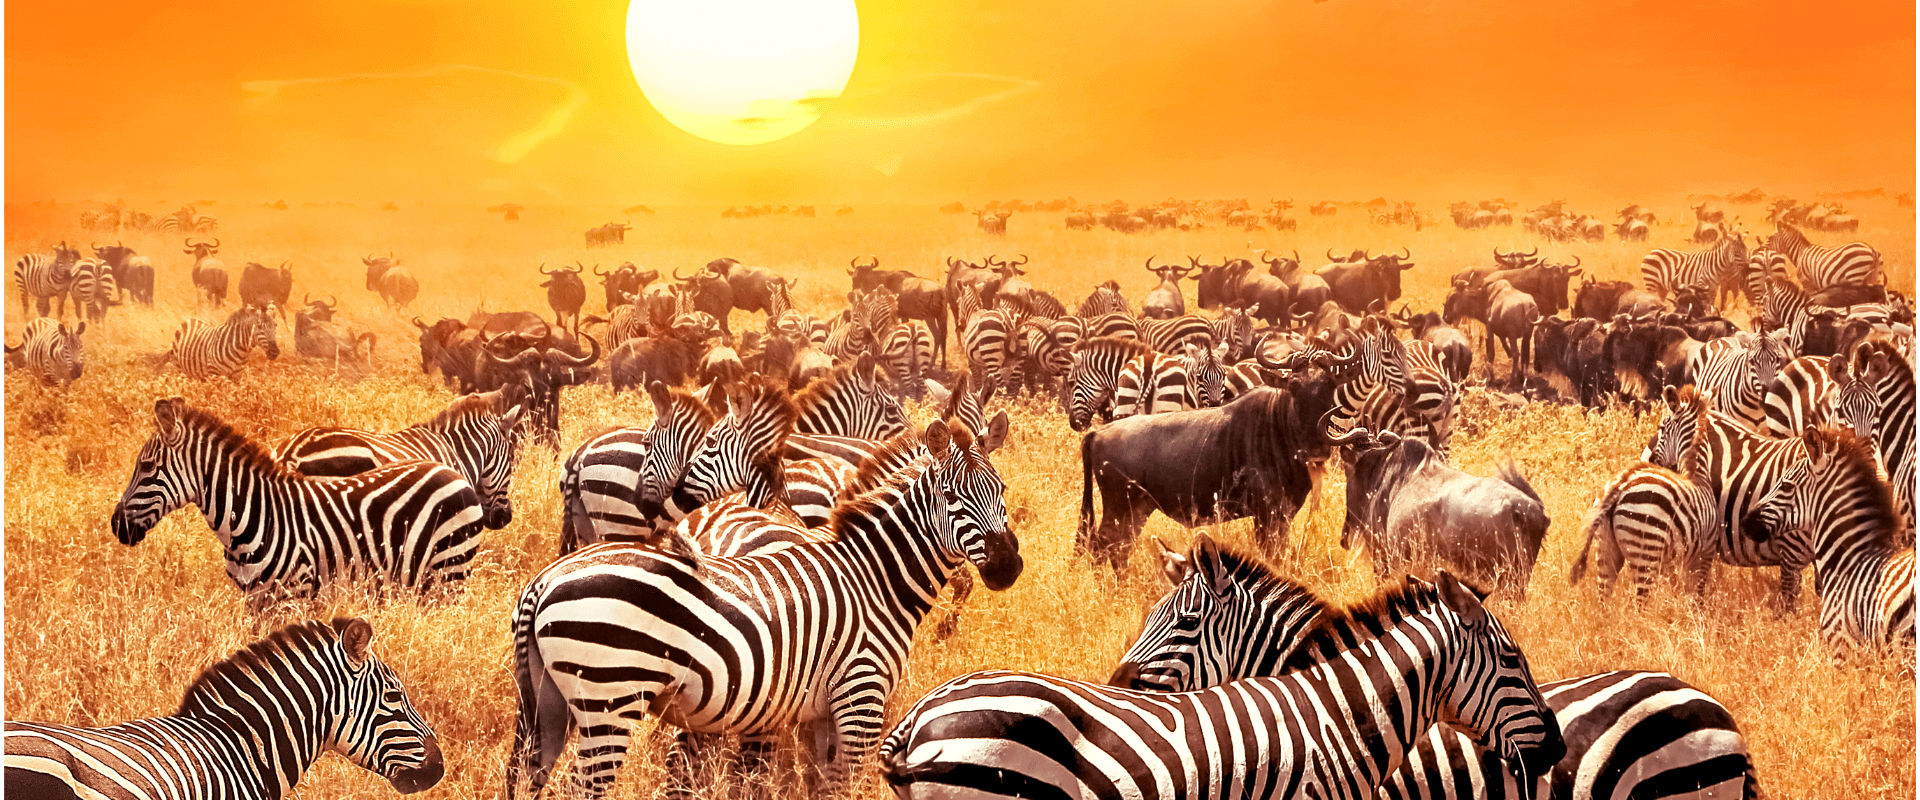 Tranquil Beauty Botswana Safari Tour